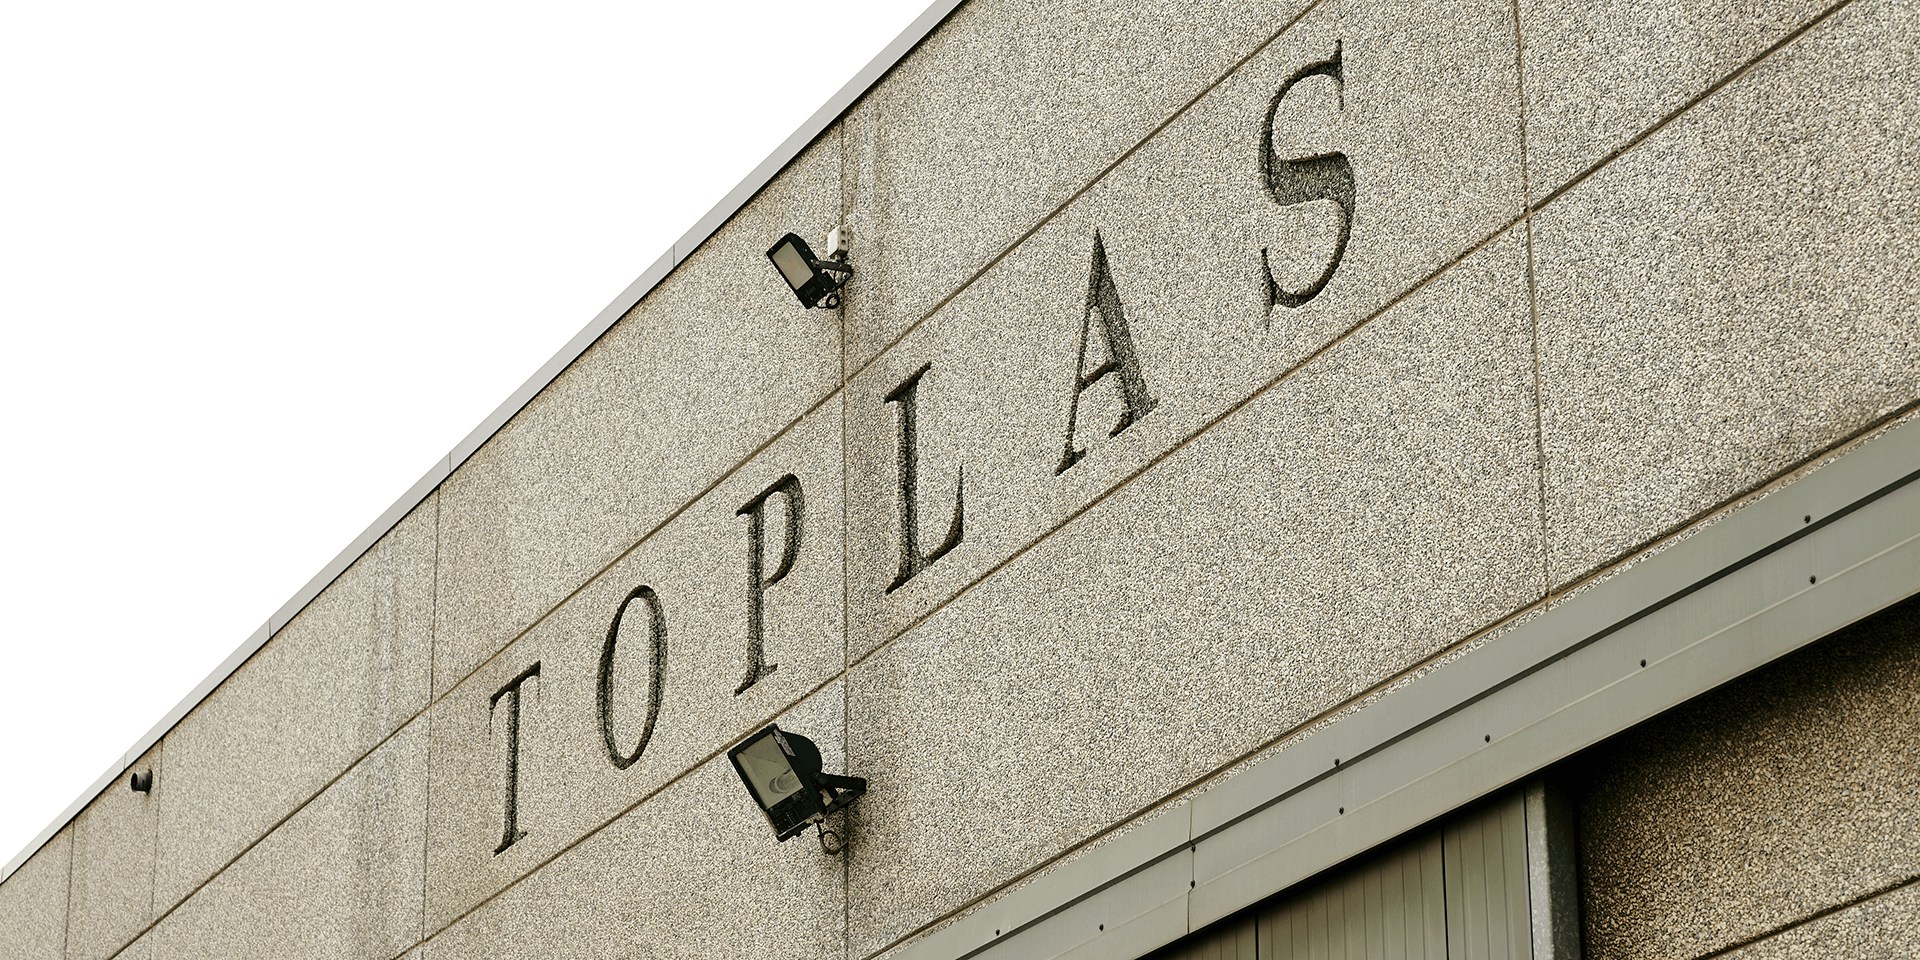 Contact Toplas